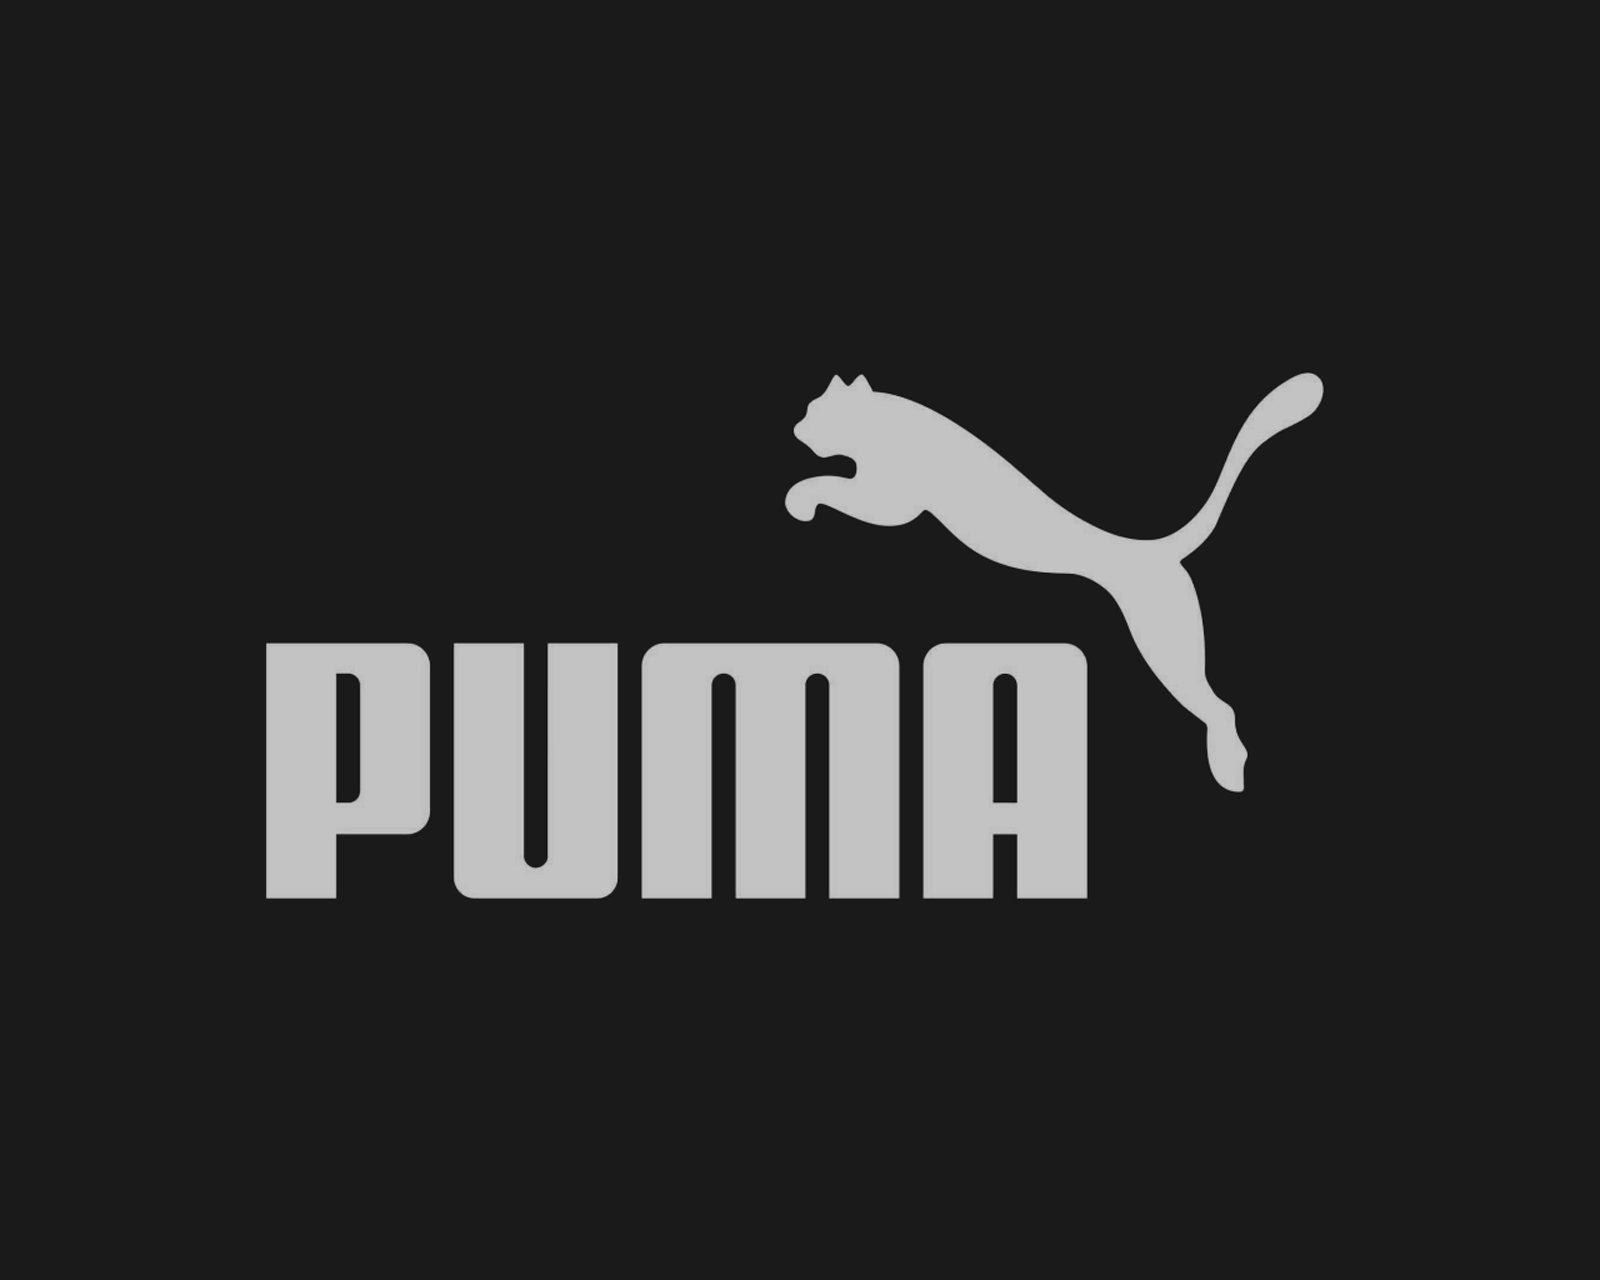 Puma Logo Wallpapers HD Backgrounds WallpapersIn4knet 1600x1280